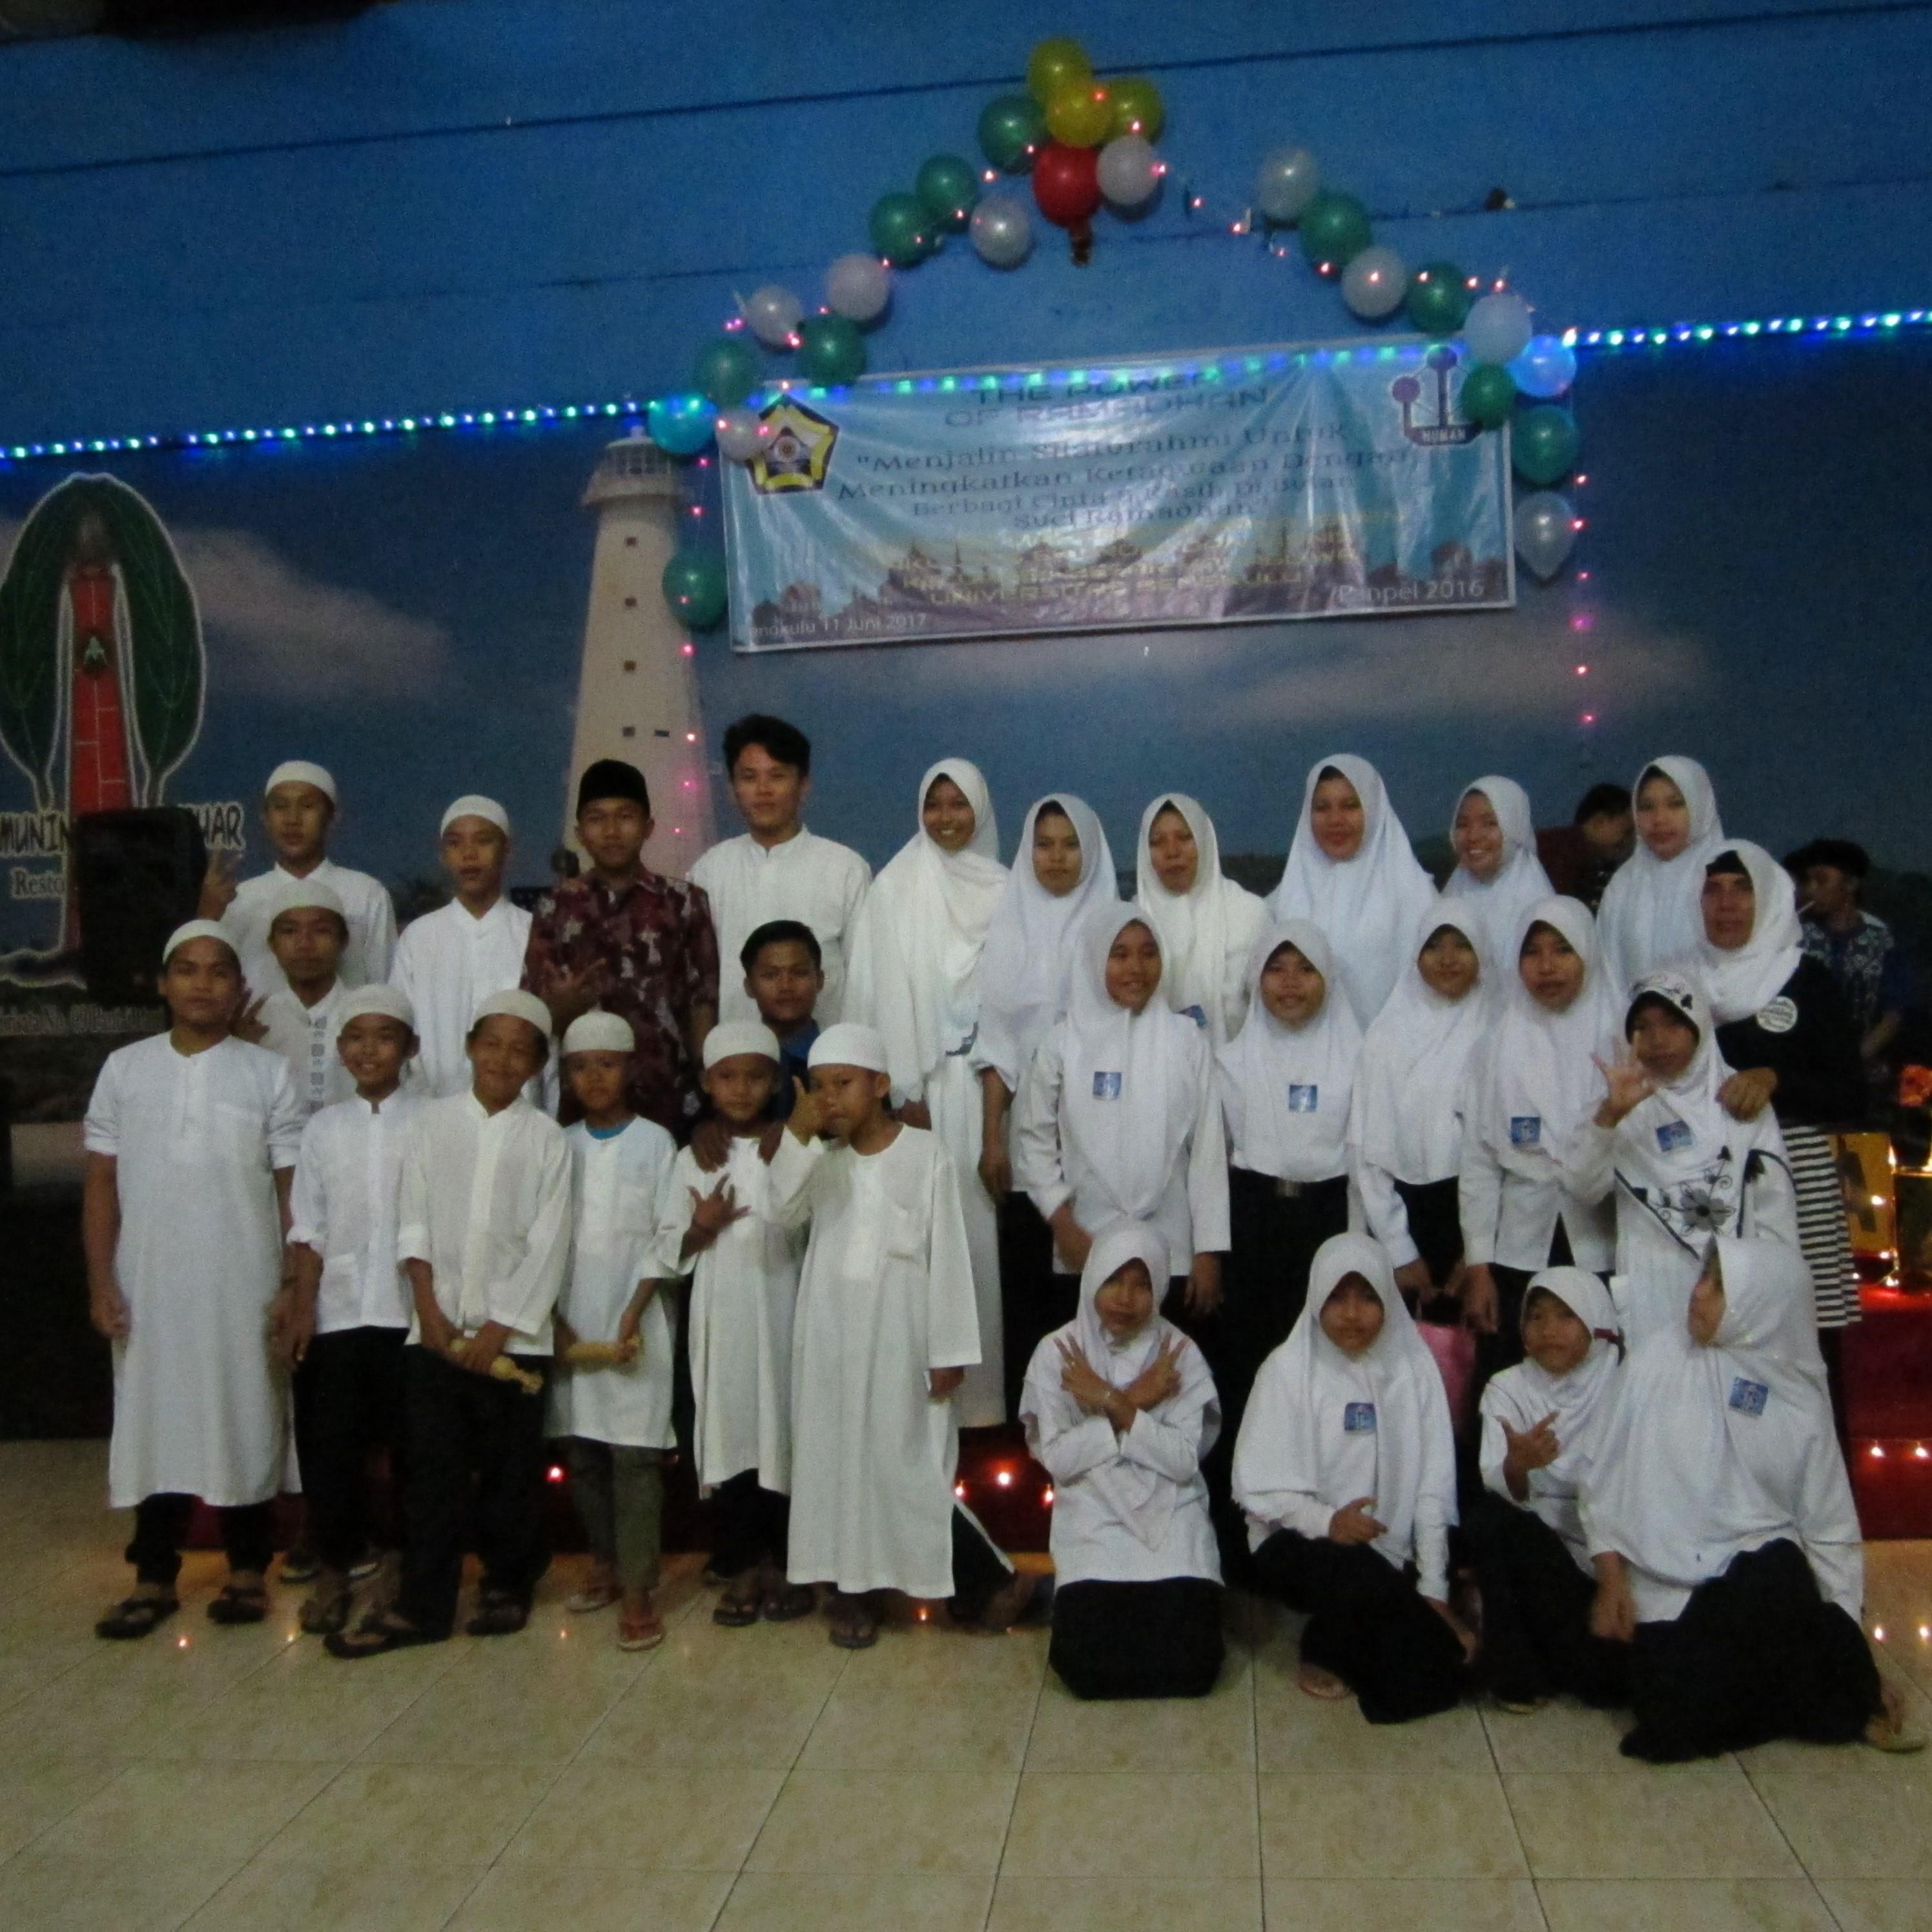 Buka Puasa Bersama Himpunan Mahasiswa Manajemen Universitas Bengkulu Bersama Anak Panti Asuhan Bumi Nusantara 1438 H